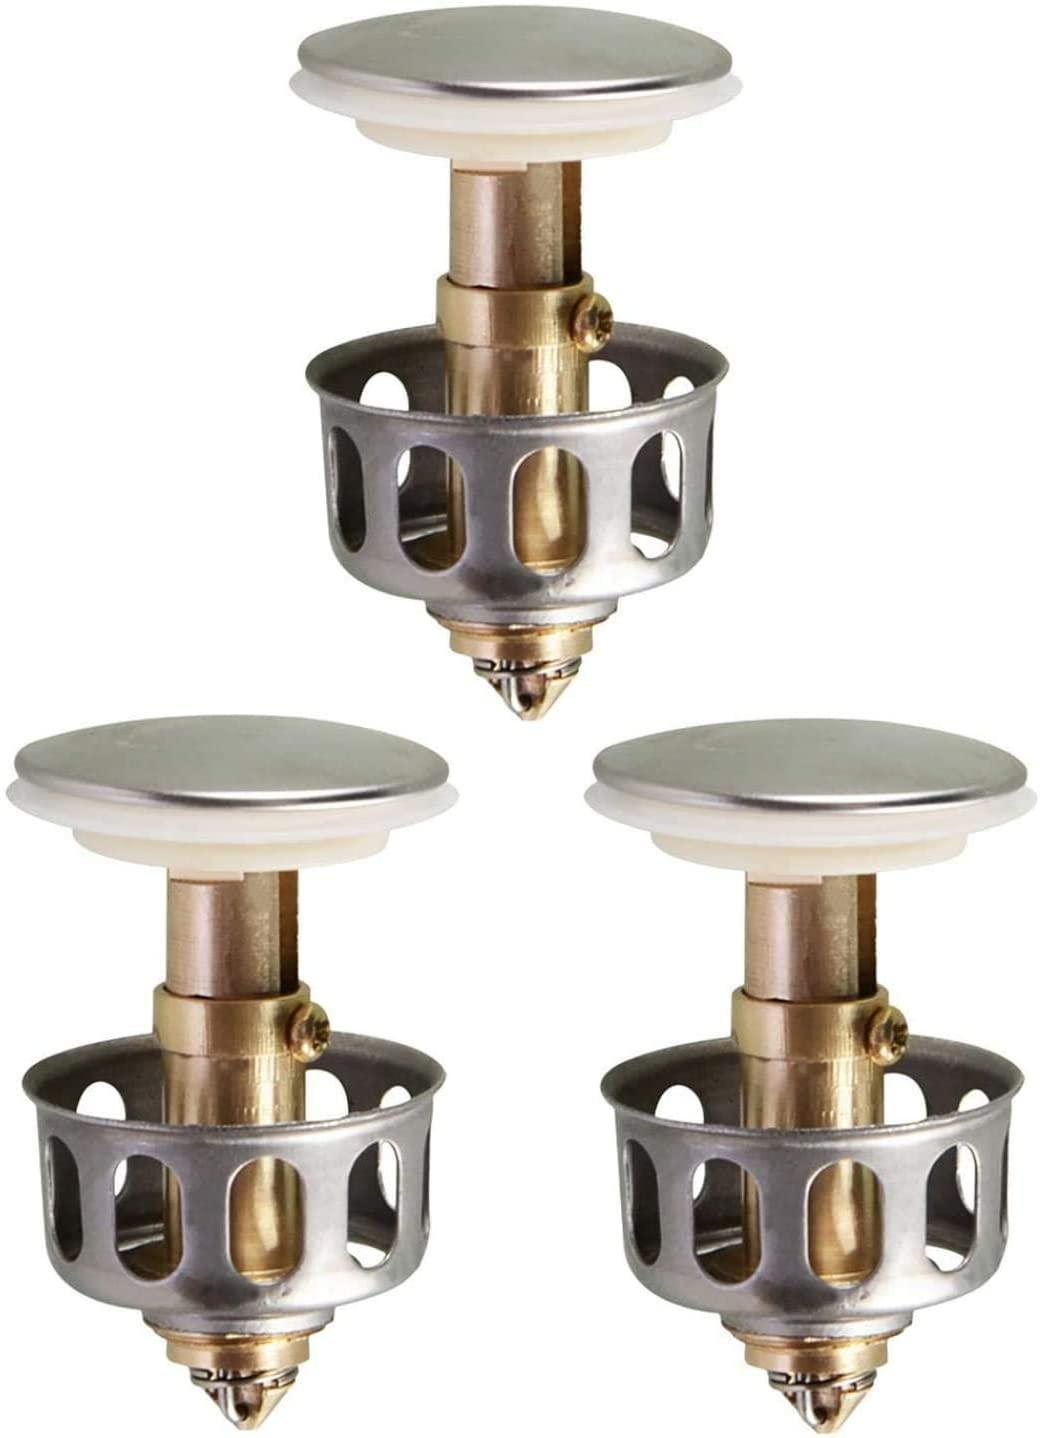 SAINGACE Universal Wash Basin Pop Up Drain, Bounce Bathroom Sink Drain Plug with Basket, Universal Kitchen Bathroom Strainer Sink Drain Stopper Pop Up Plugs 1.38'' Diameter (3 Pcs)